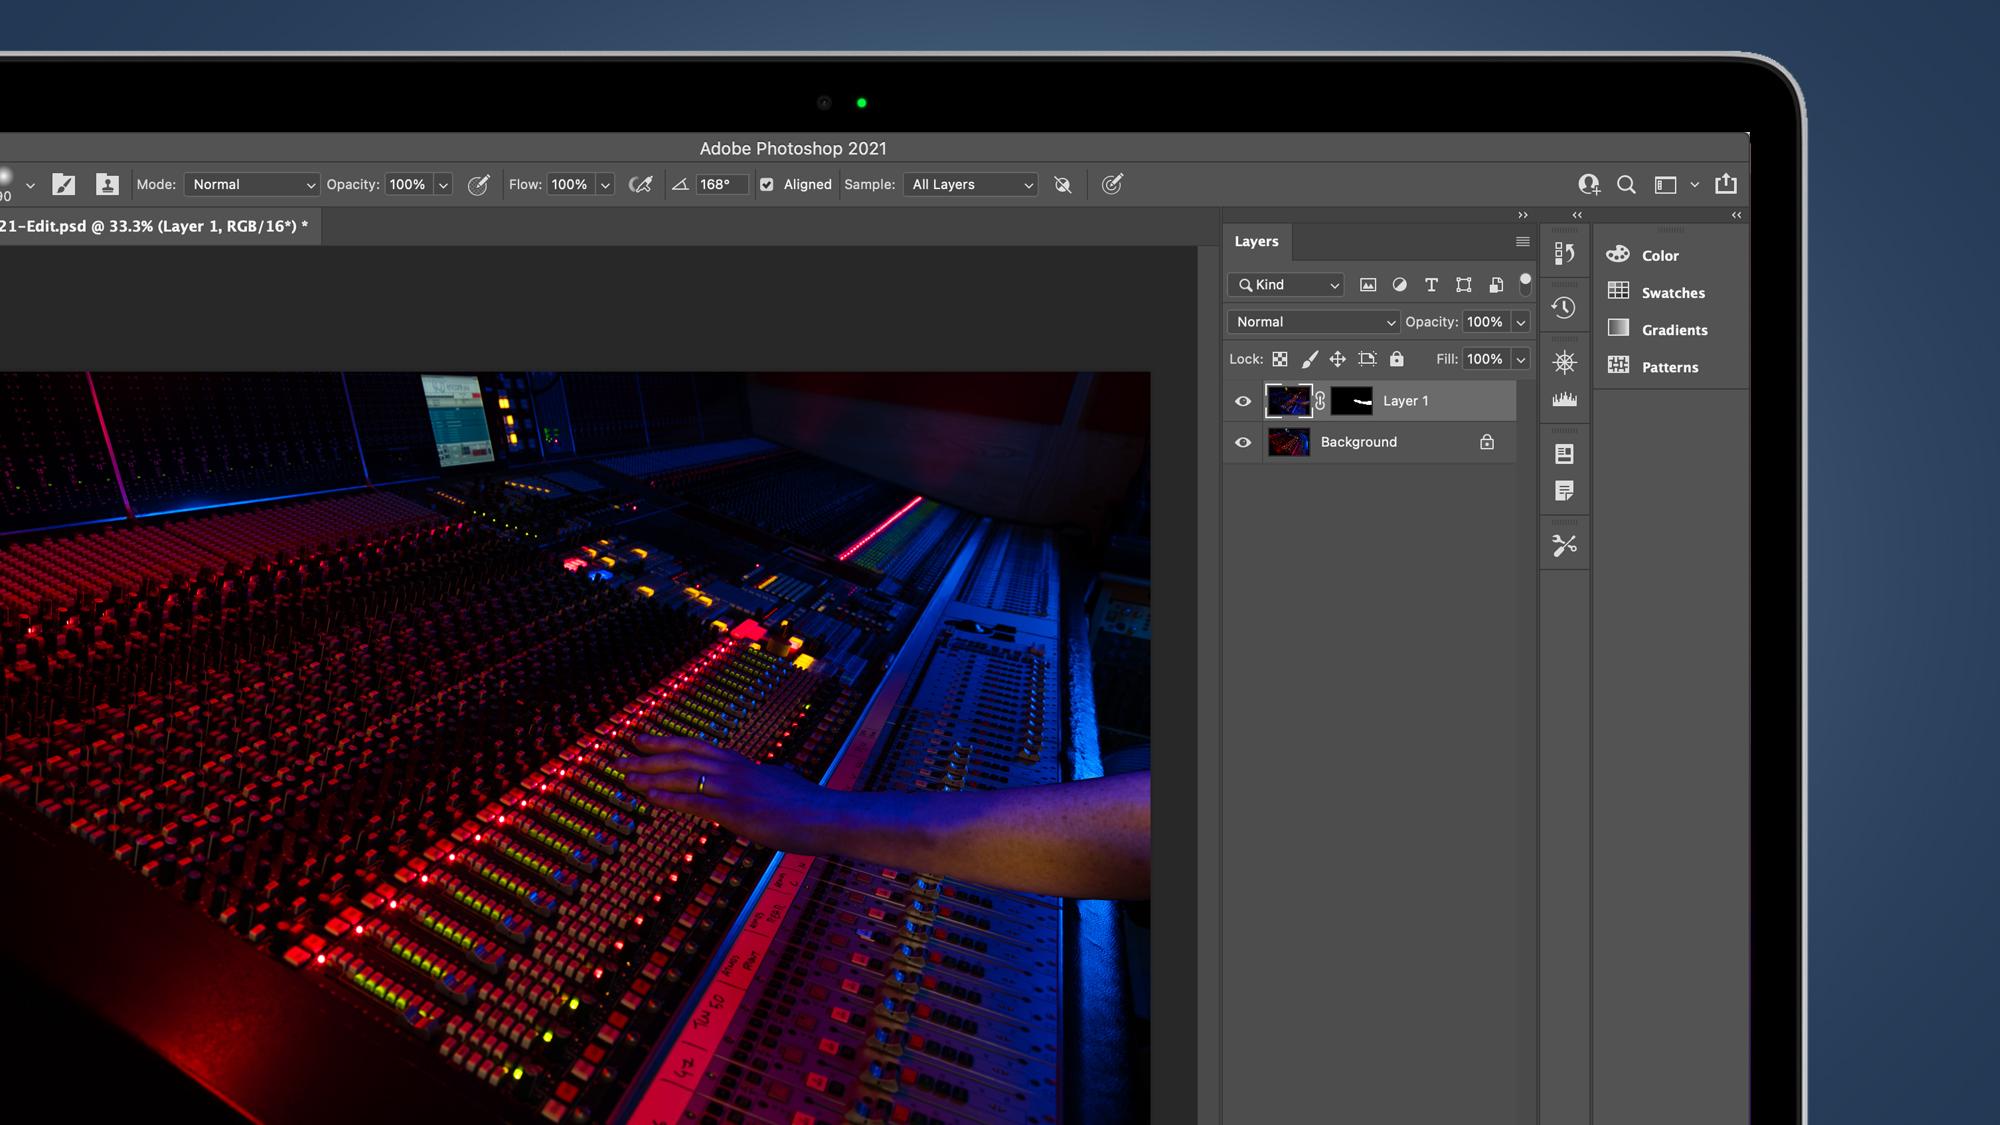 Pantalla de computadora portátil que muestra capas de Photoshop